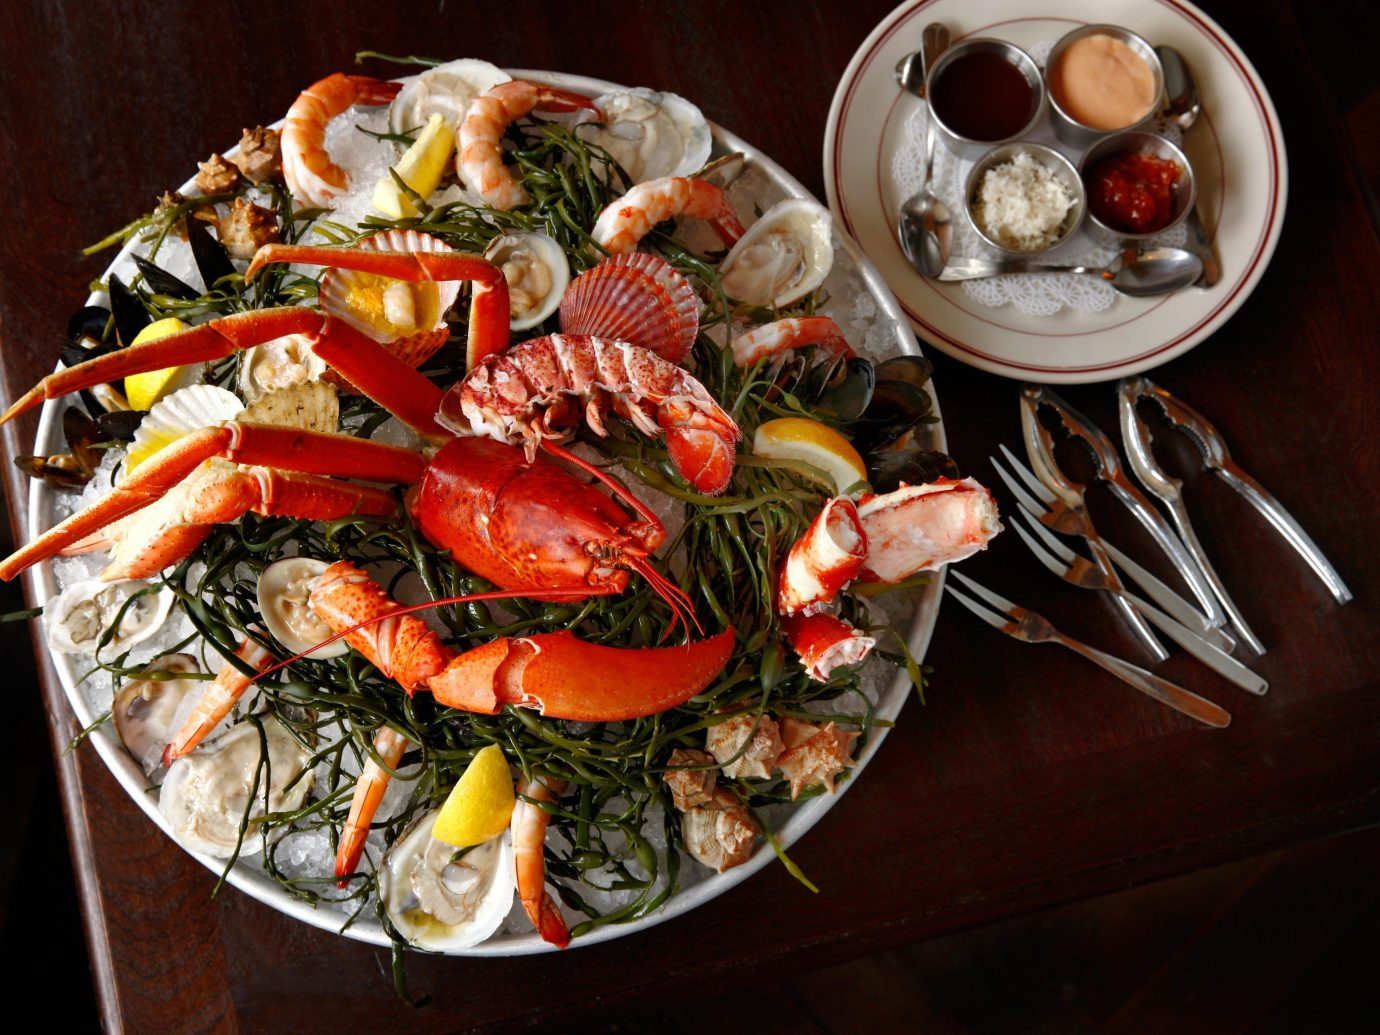 Food + Drink food dish Seafood meal cuisine invertebrate fish mussel animal source foods seafood boil